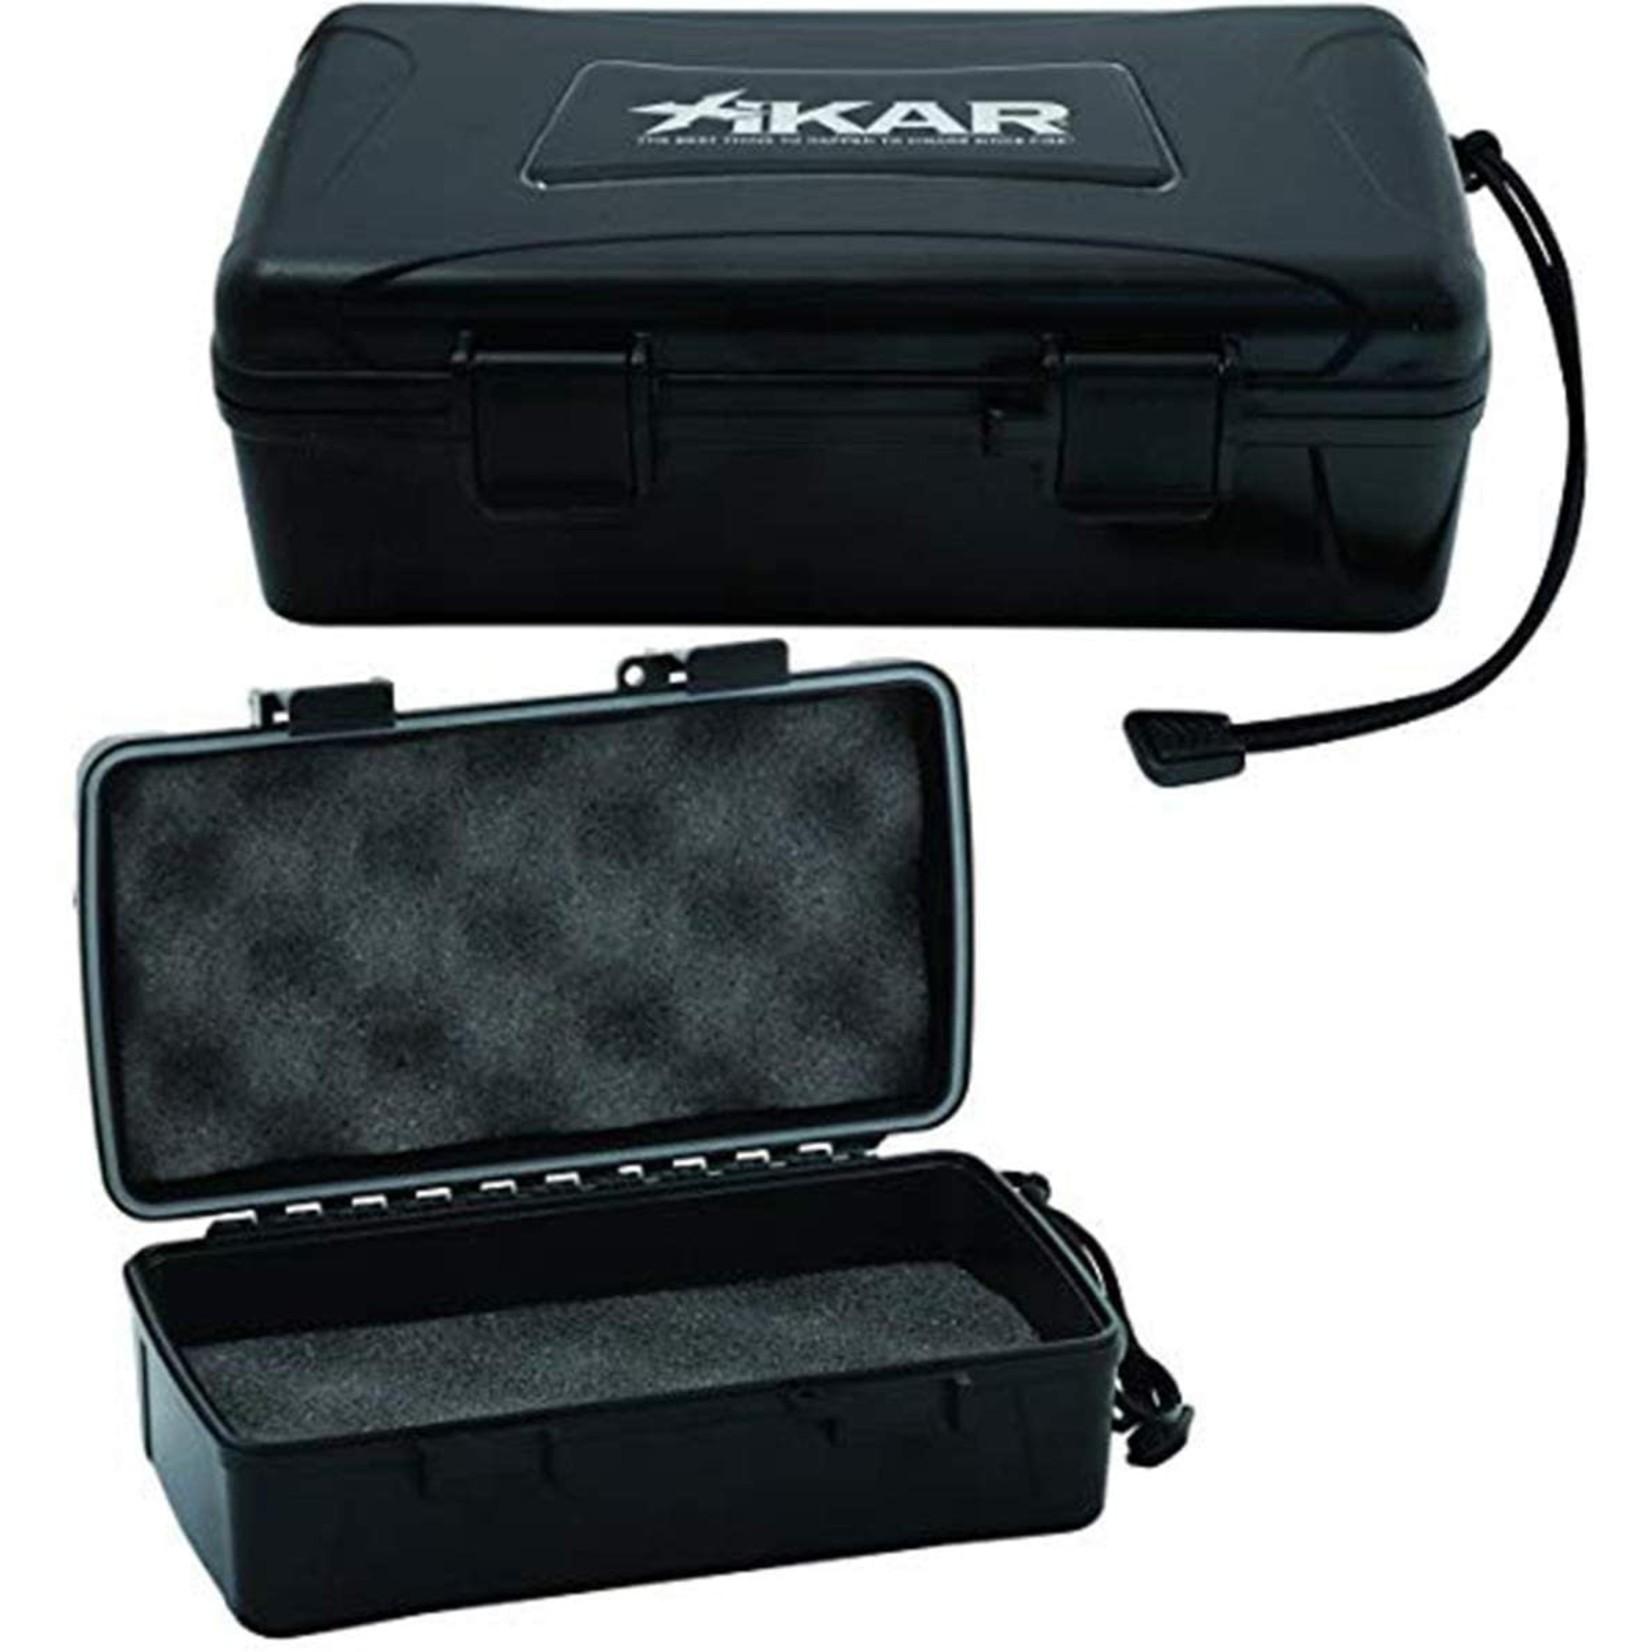 Xikar Cigar Travel Case